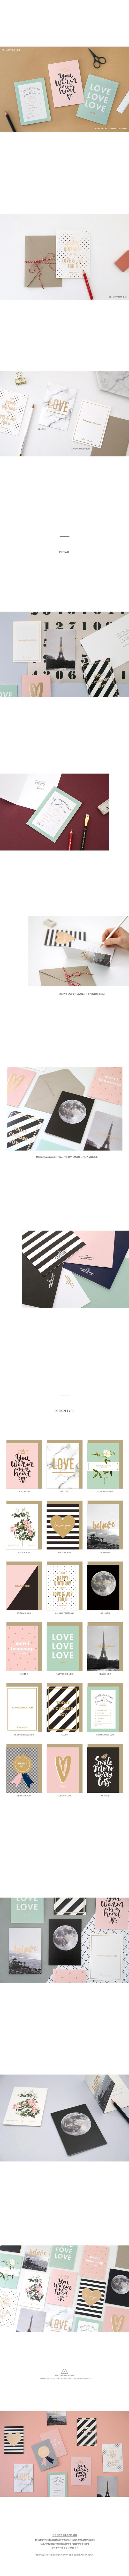 MESSAGE CARD ver.11,800원-세컨드맨션디자인문구, 카드/편지/봉투, 카드, 축하 카드바보사랑MESSAGE CARD ver.11,800원-세컨드맨션디자인문구, 카드/편지/봉투, 카드, 축하 카드바보사랑